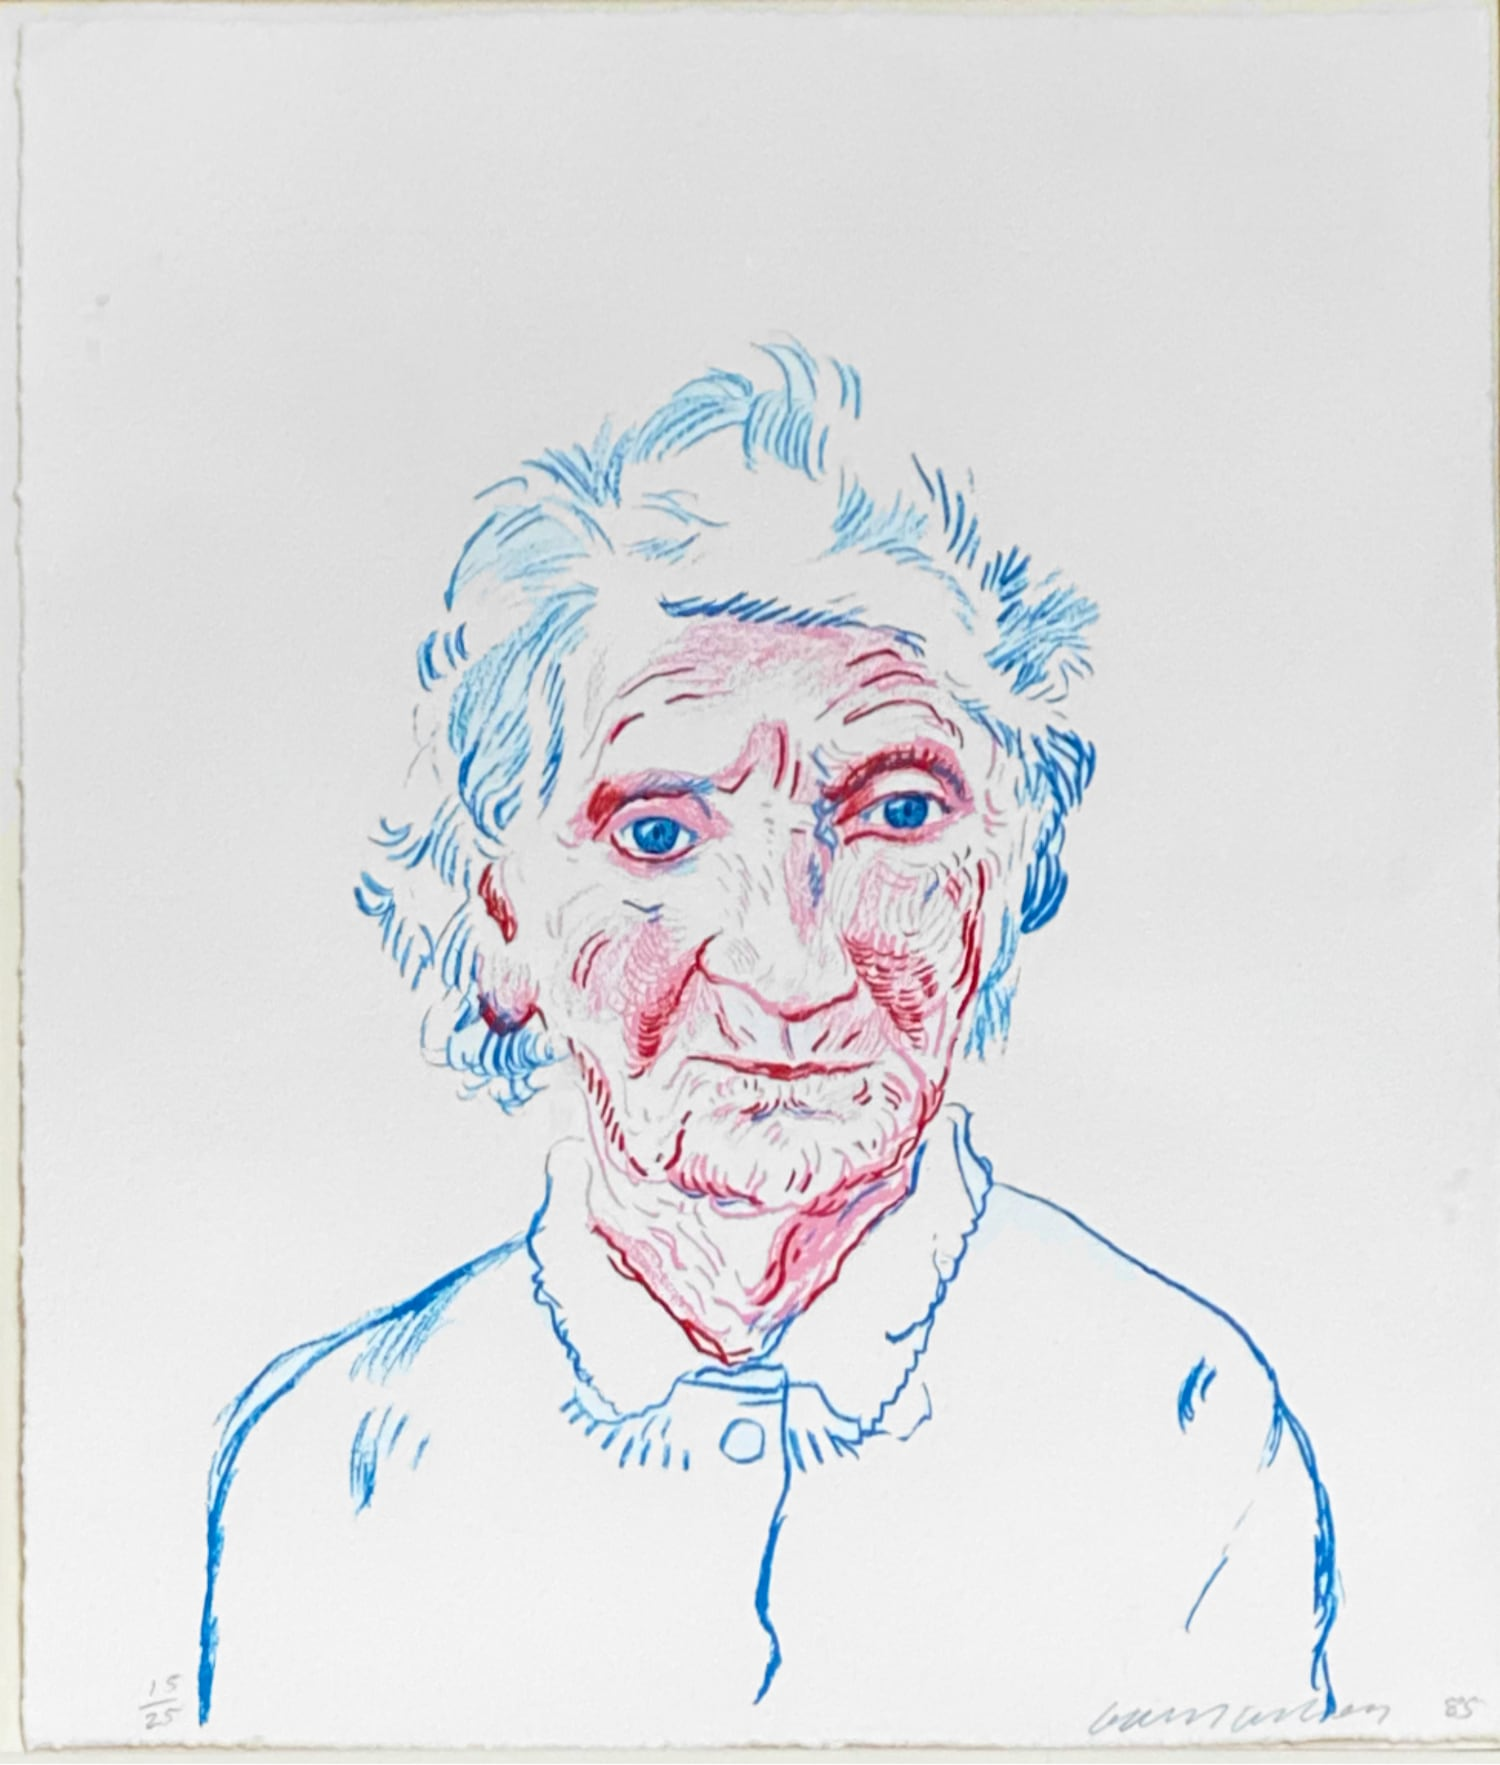 Portrait of Mother 3 by David Hockney